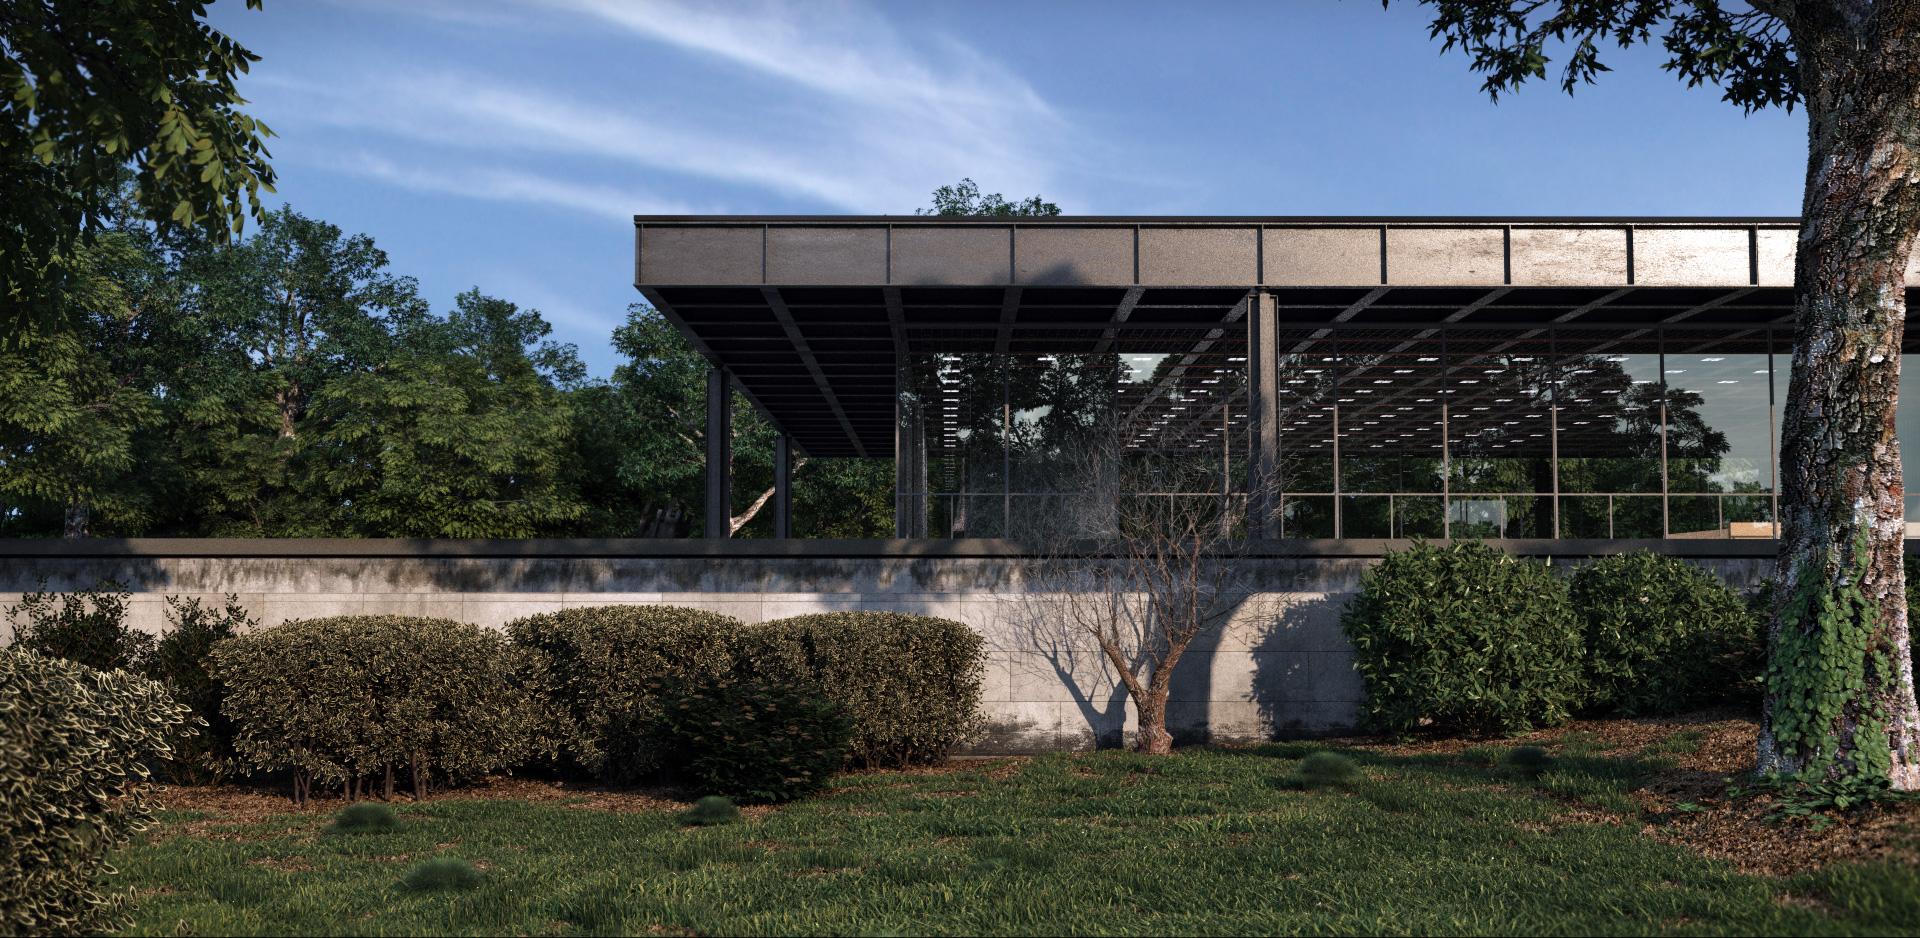 arquitectura2-muvhaus-3dvisualization